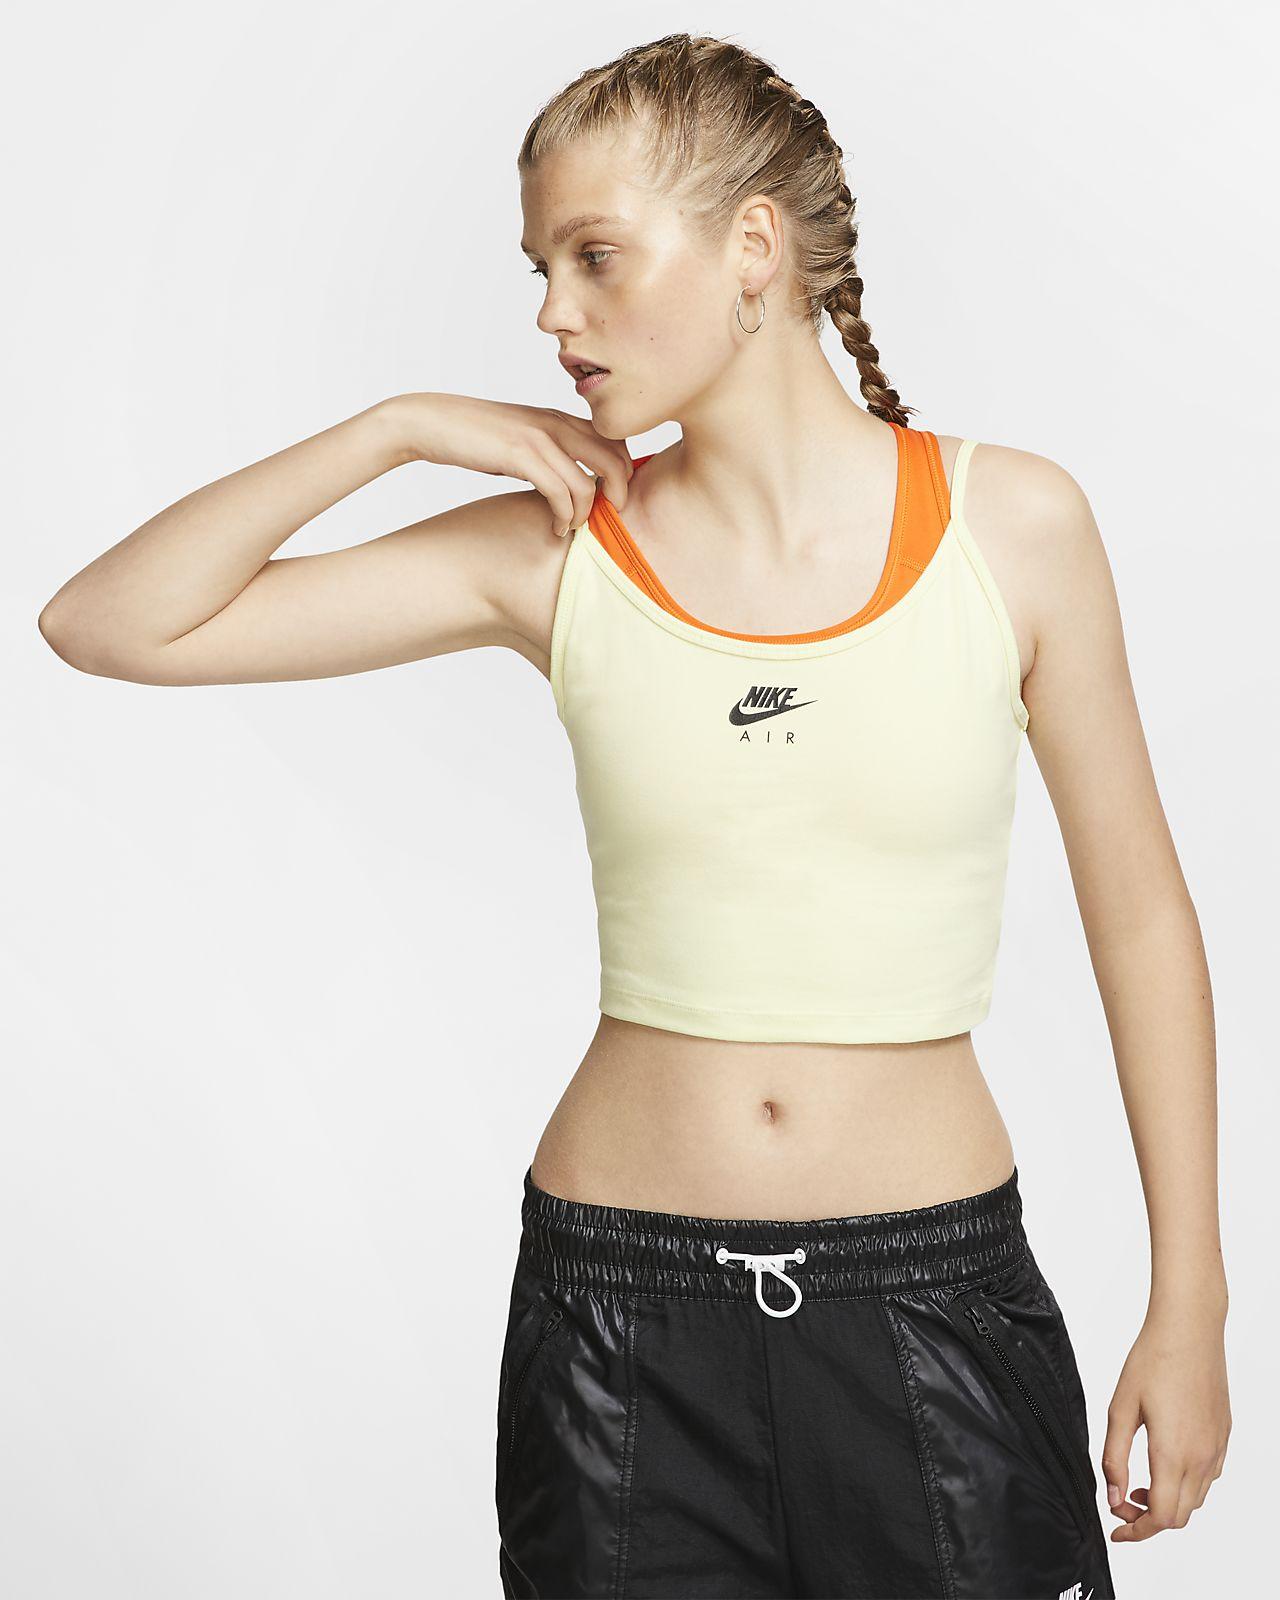 Canotta Nike Air - Donna